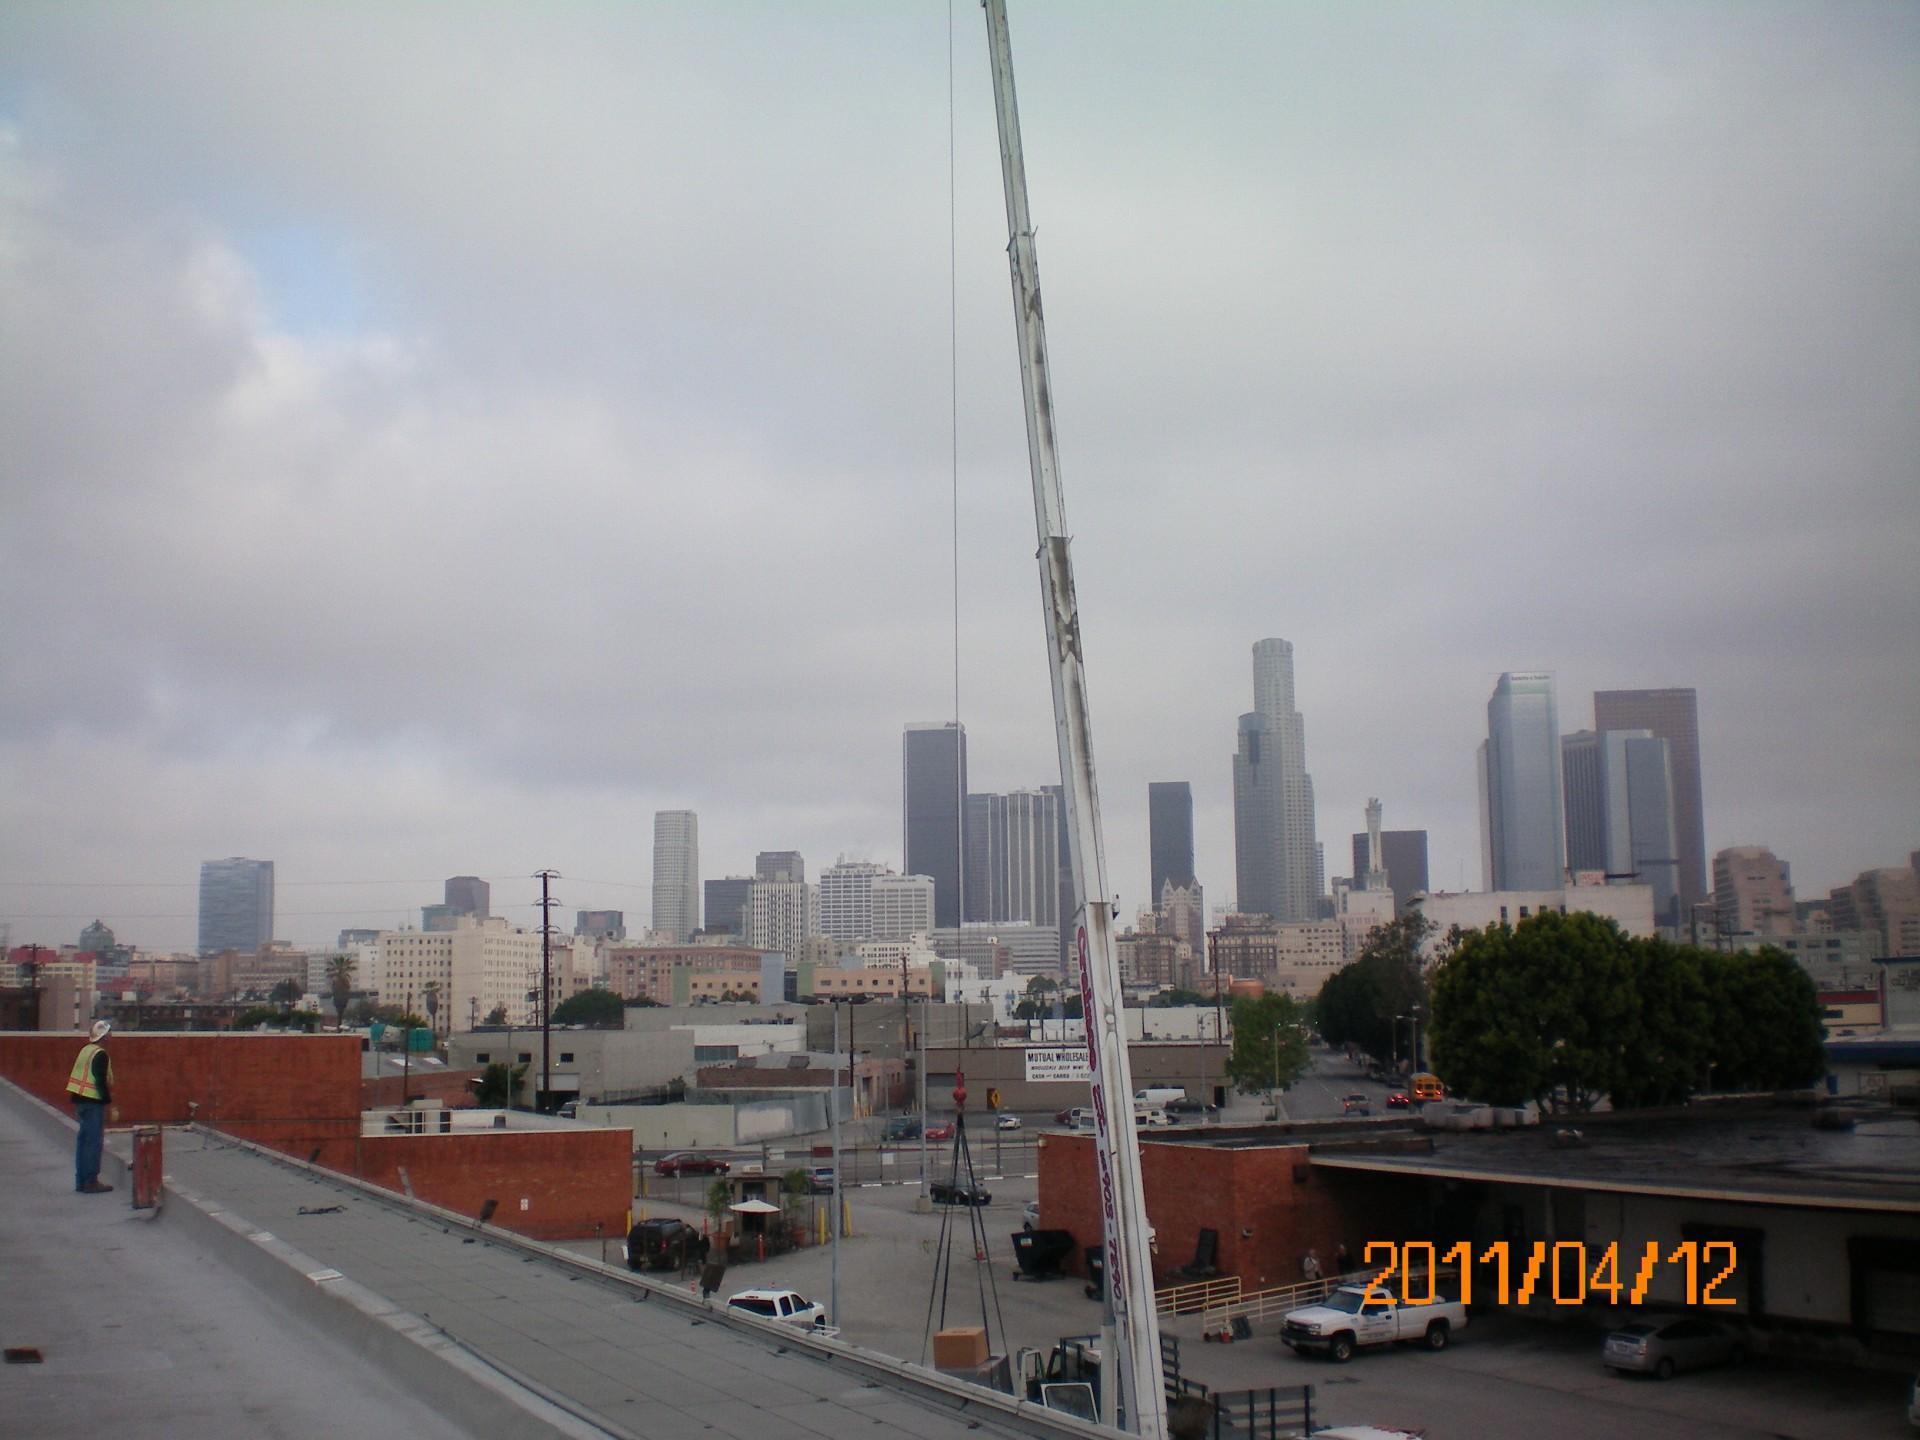 2011-04-12 07.32.27